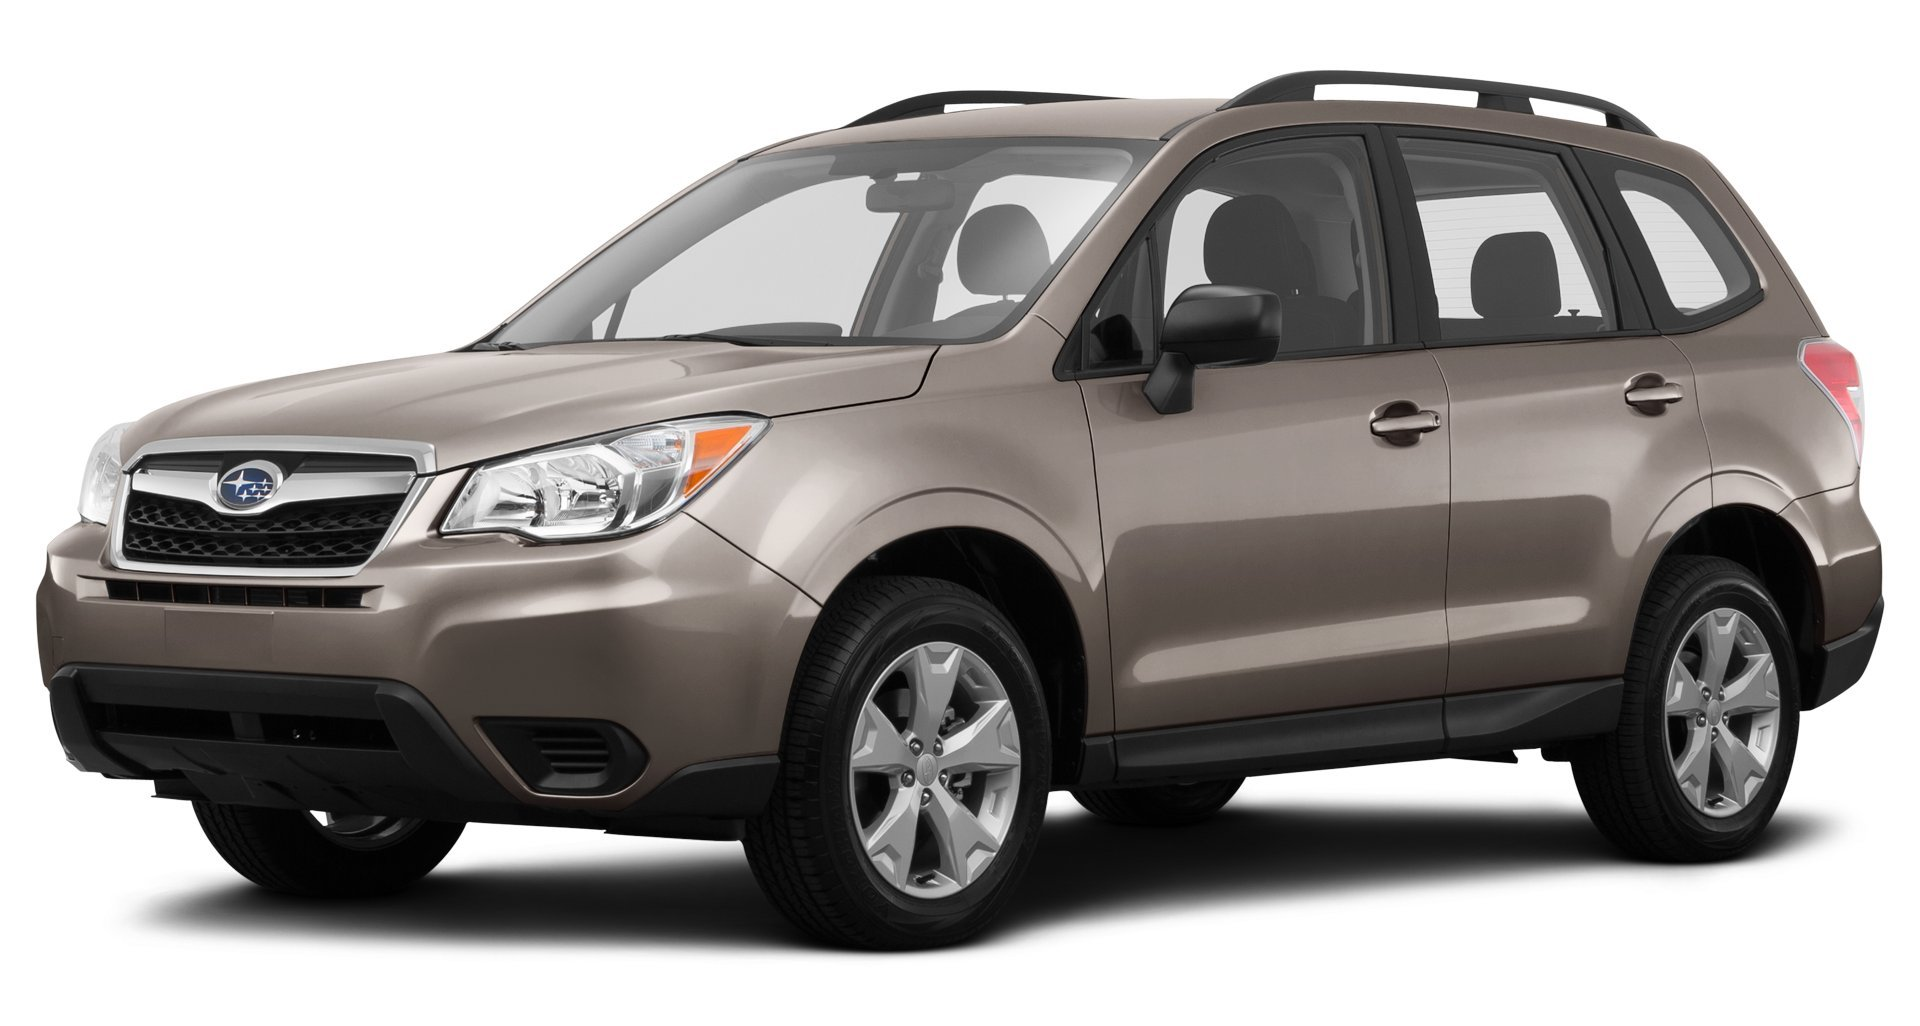 Amazon.com: 2015 Subaru XV Crosstrek Reviews, Images, and